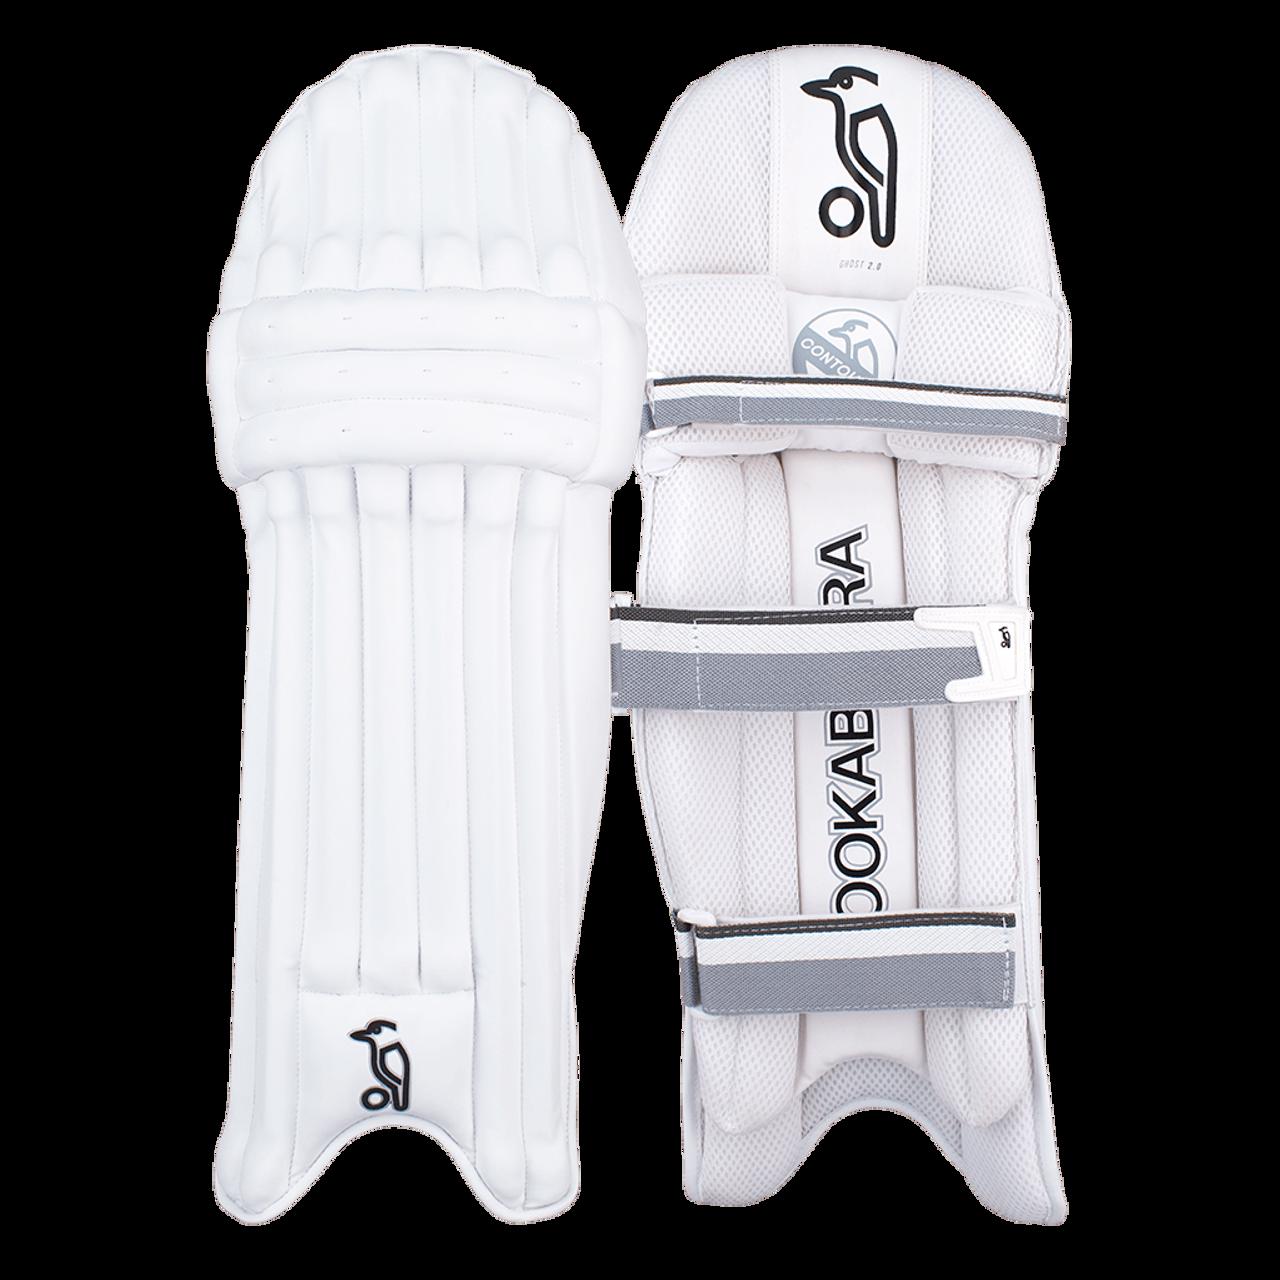 Kookaburra Blade 200 Cricket Batting Pad Mens LH